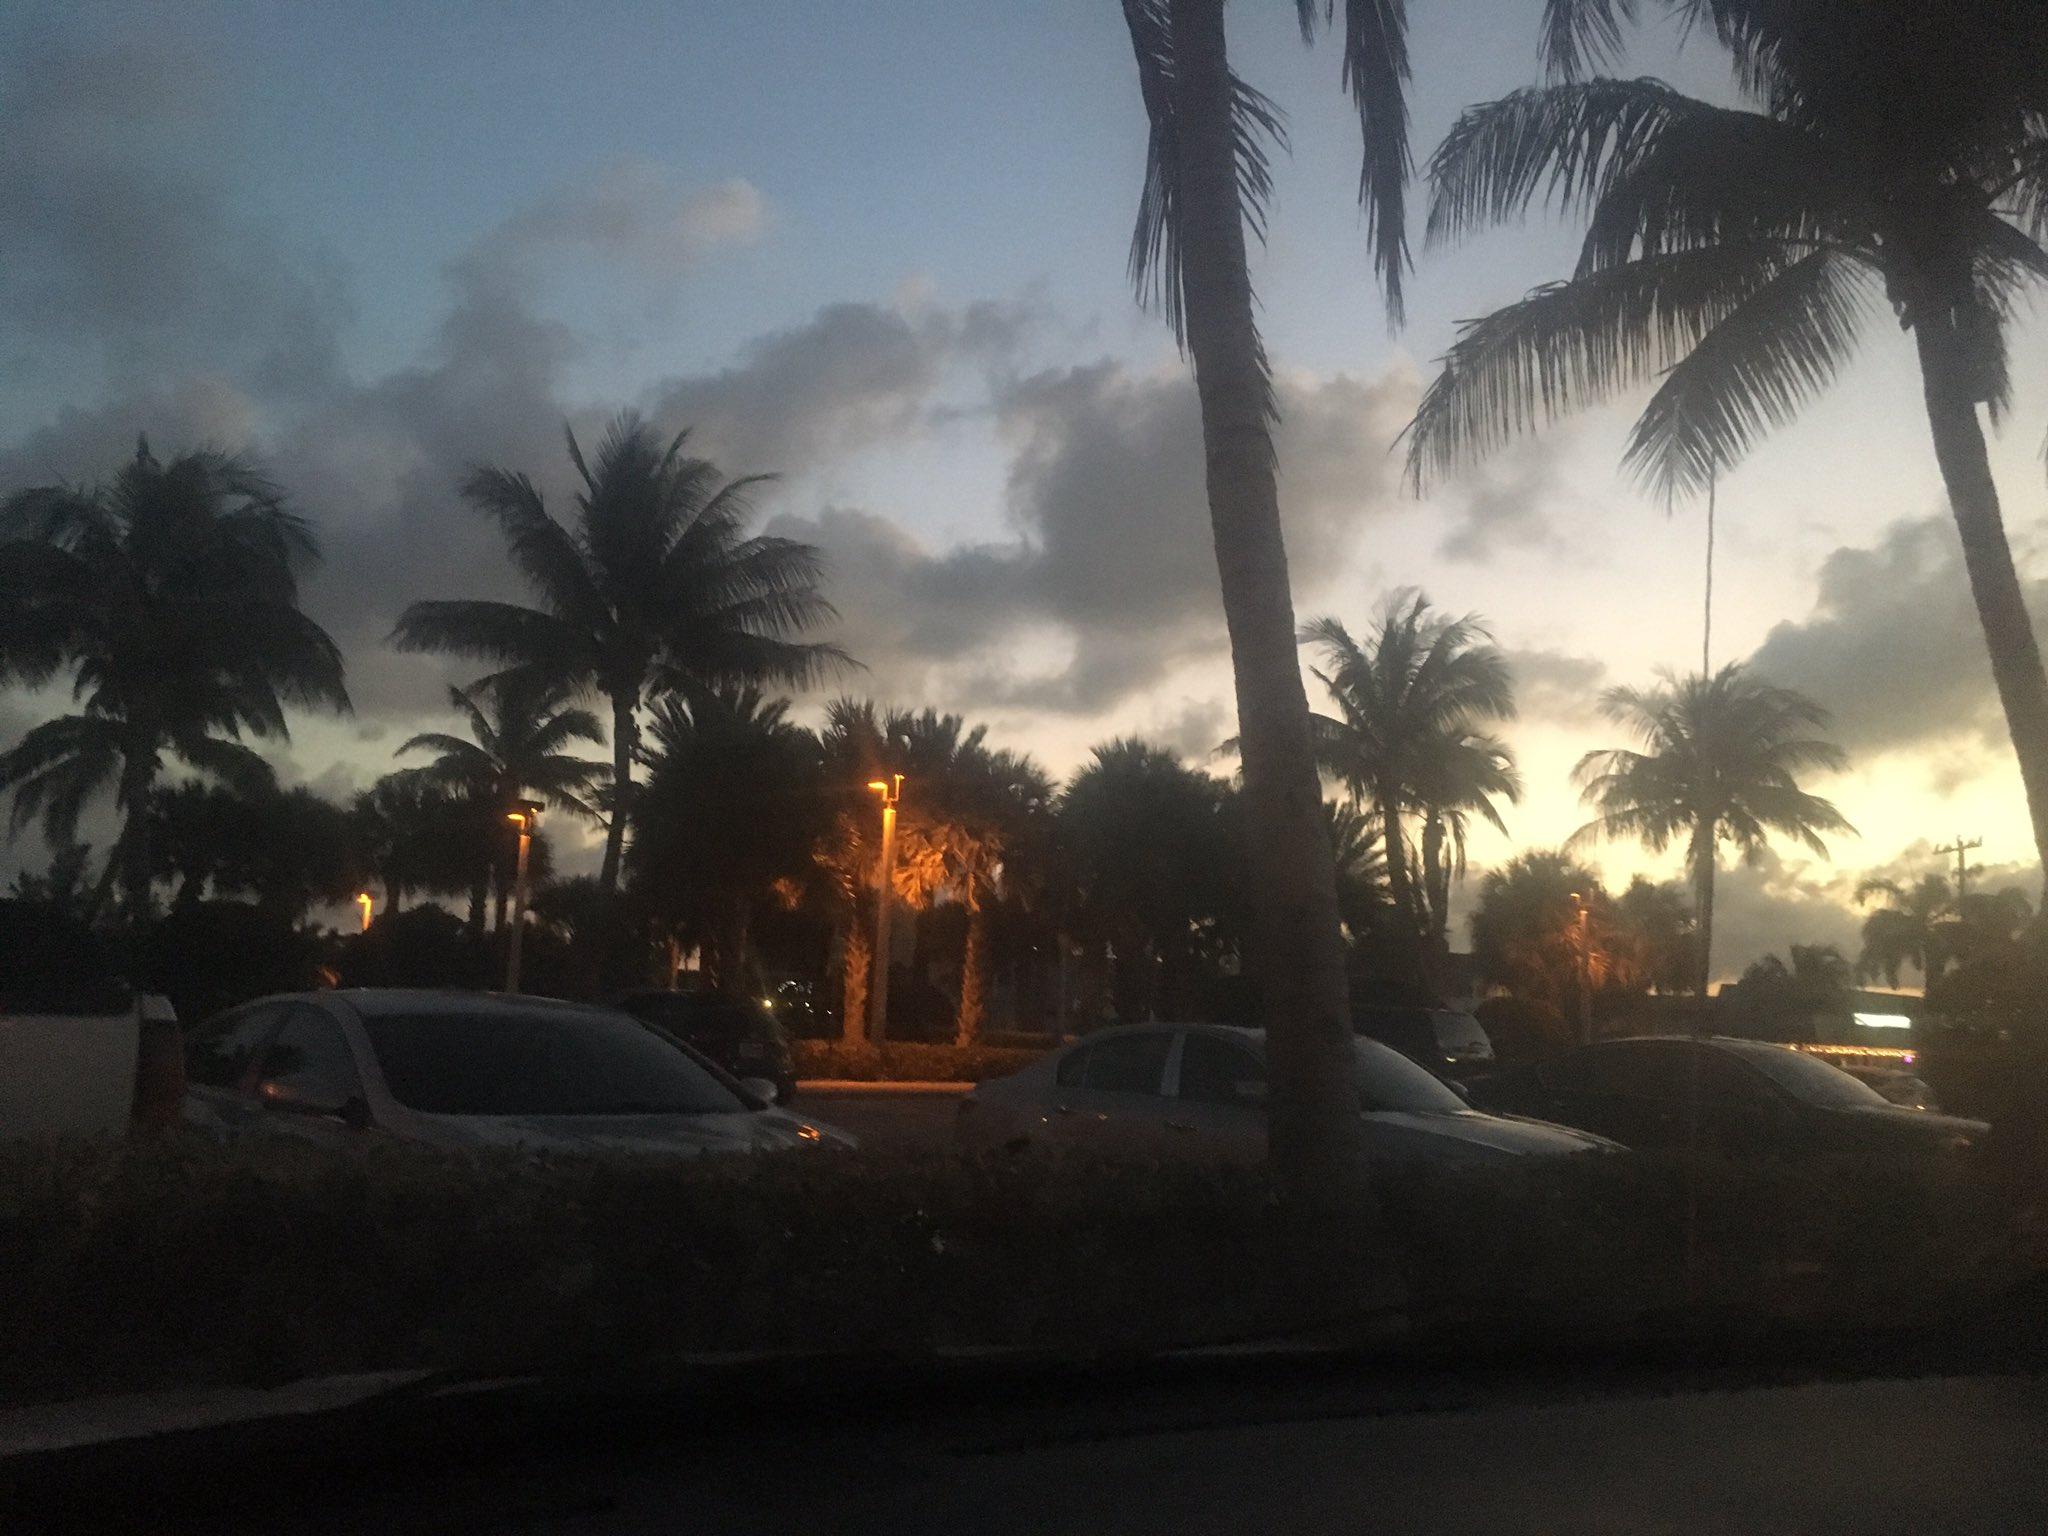 So beautiful �� #southflorida #Mistress #Beach https://t.co/yACIBG5G1f